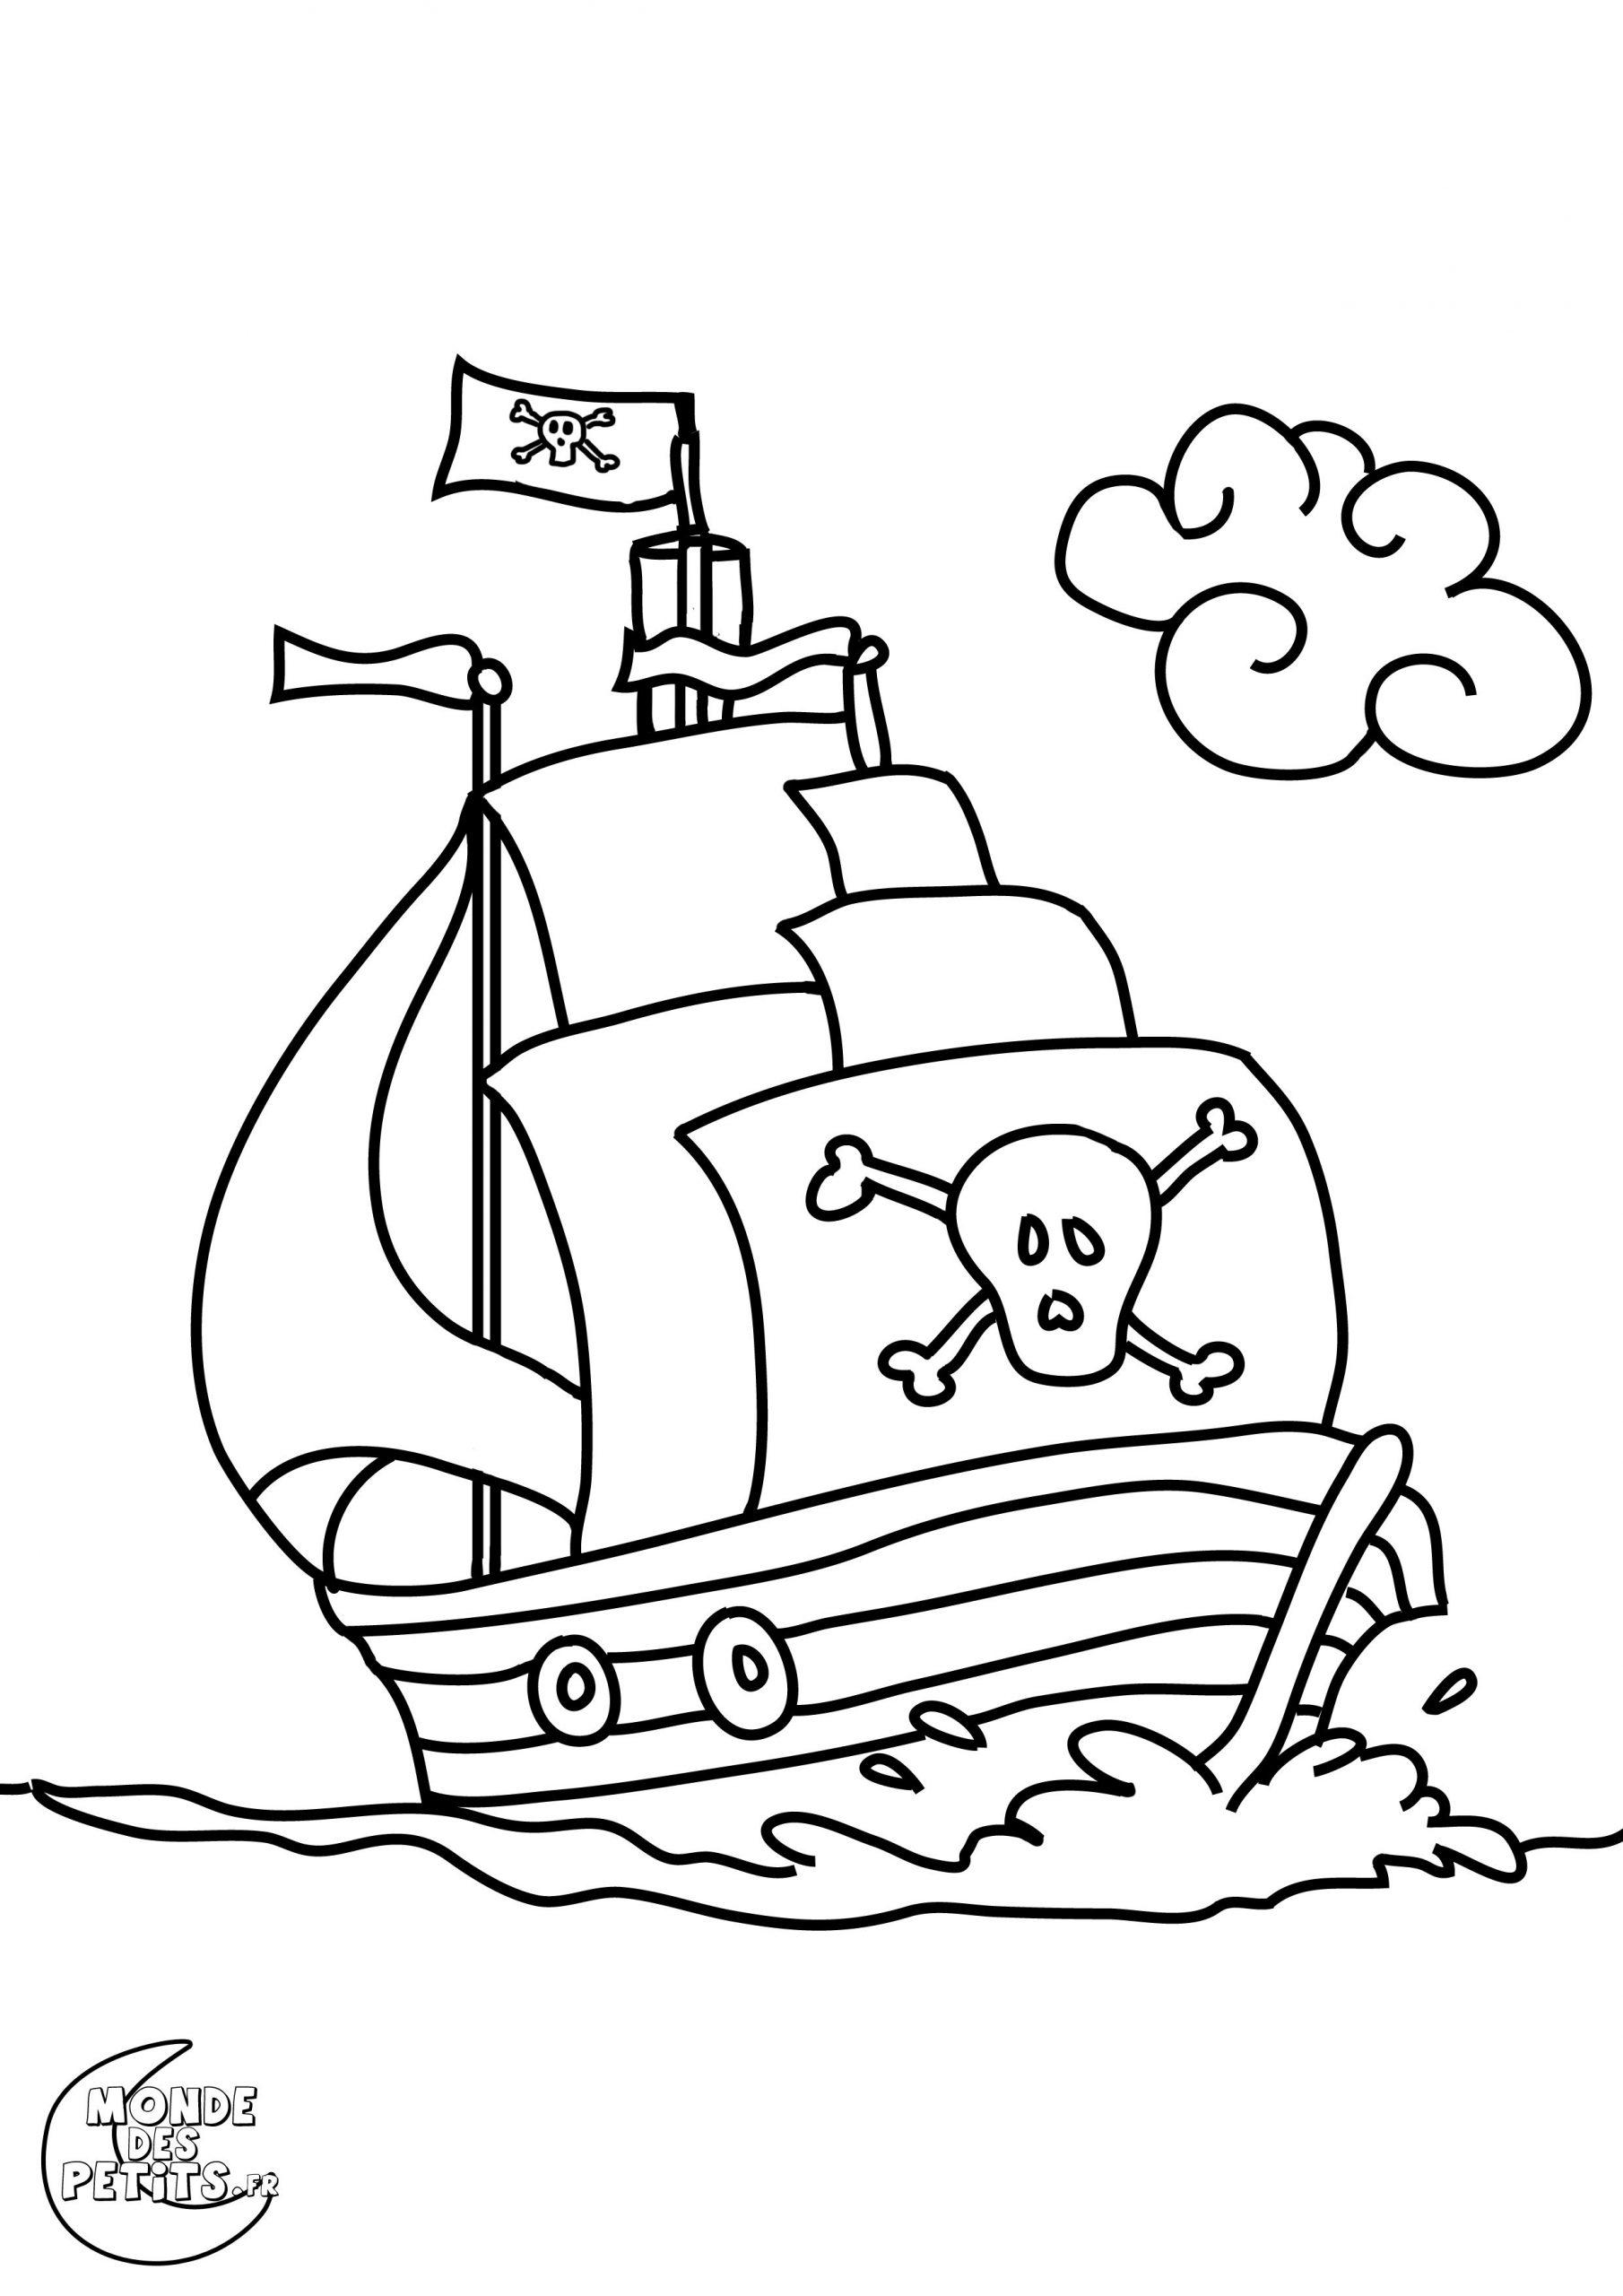 Coloriage Pirate À Colorier - Dessin À Imprimer | Coloriage serapportantà Coloriage À Imprimer Garçon